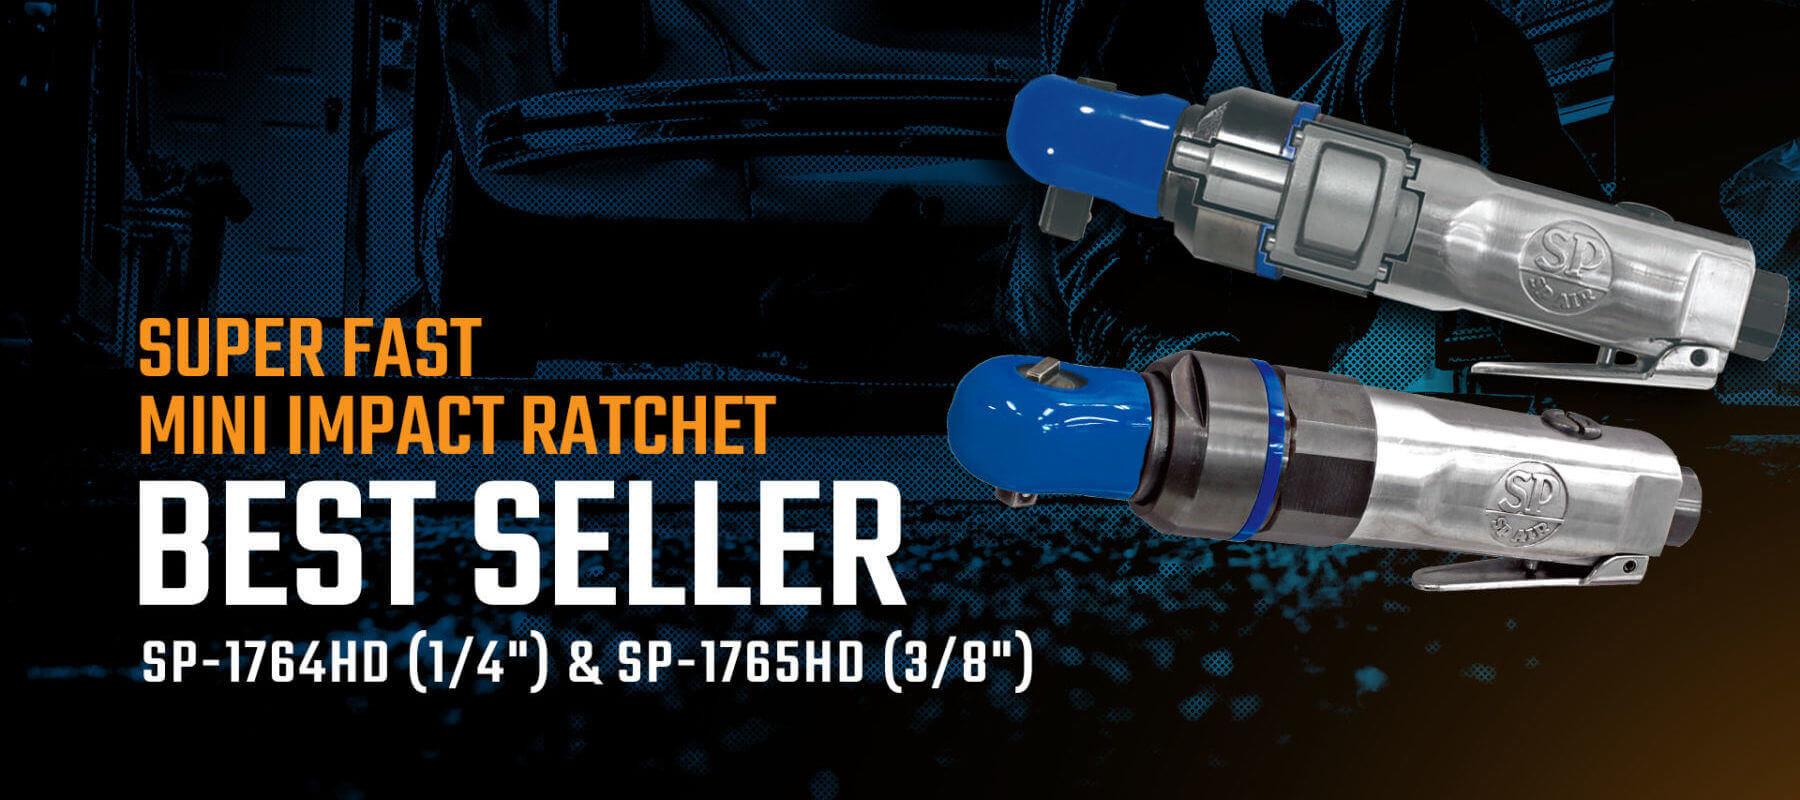 super fast mini impact ratchet